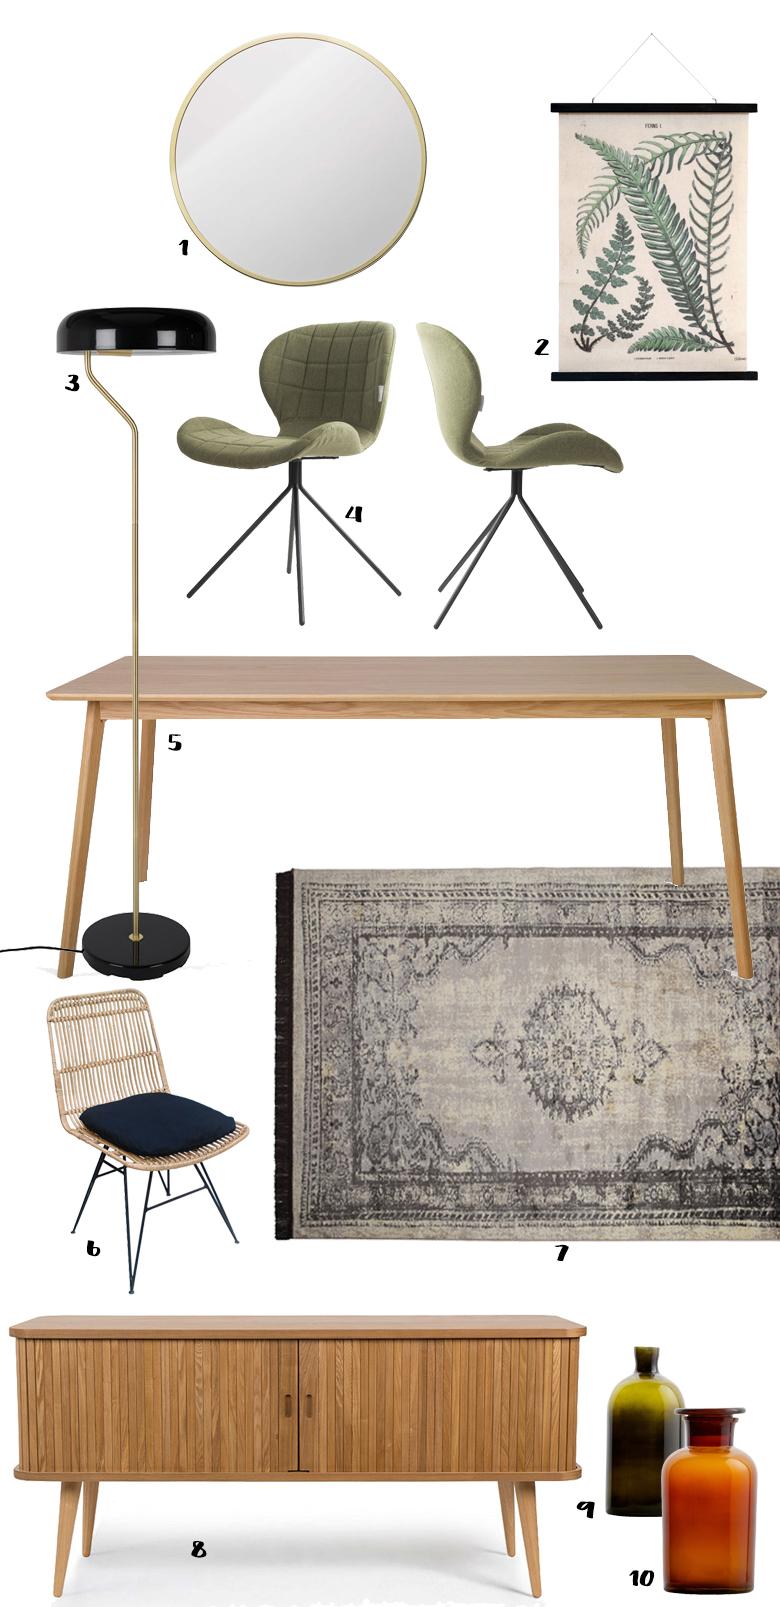 une nouvelle salle manger gr ce aux soldes d co blueberry home. Black Bedroom Furniture Sets. Home Design Ideas